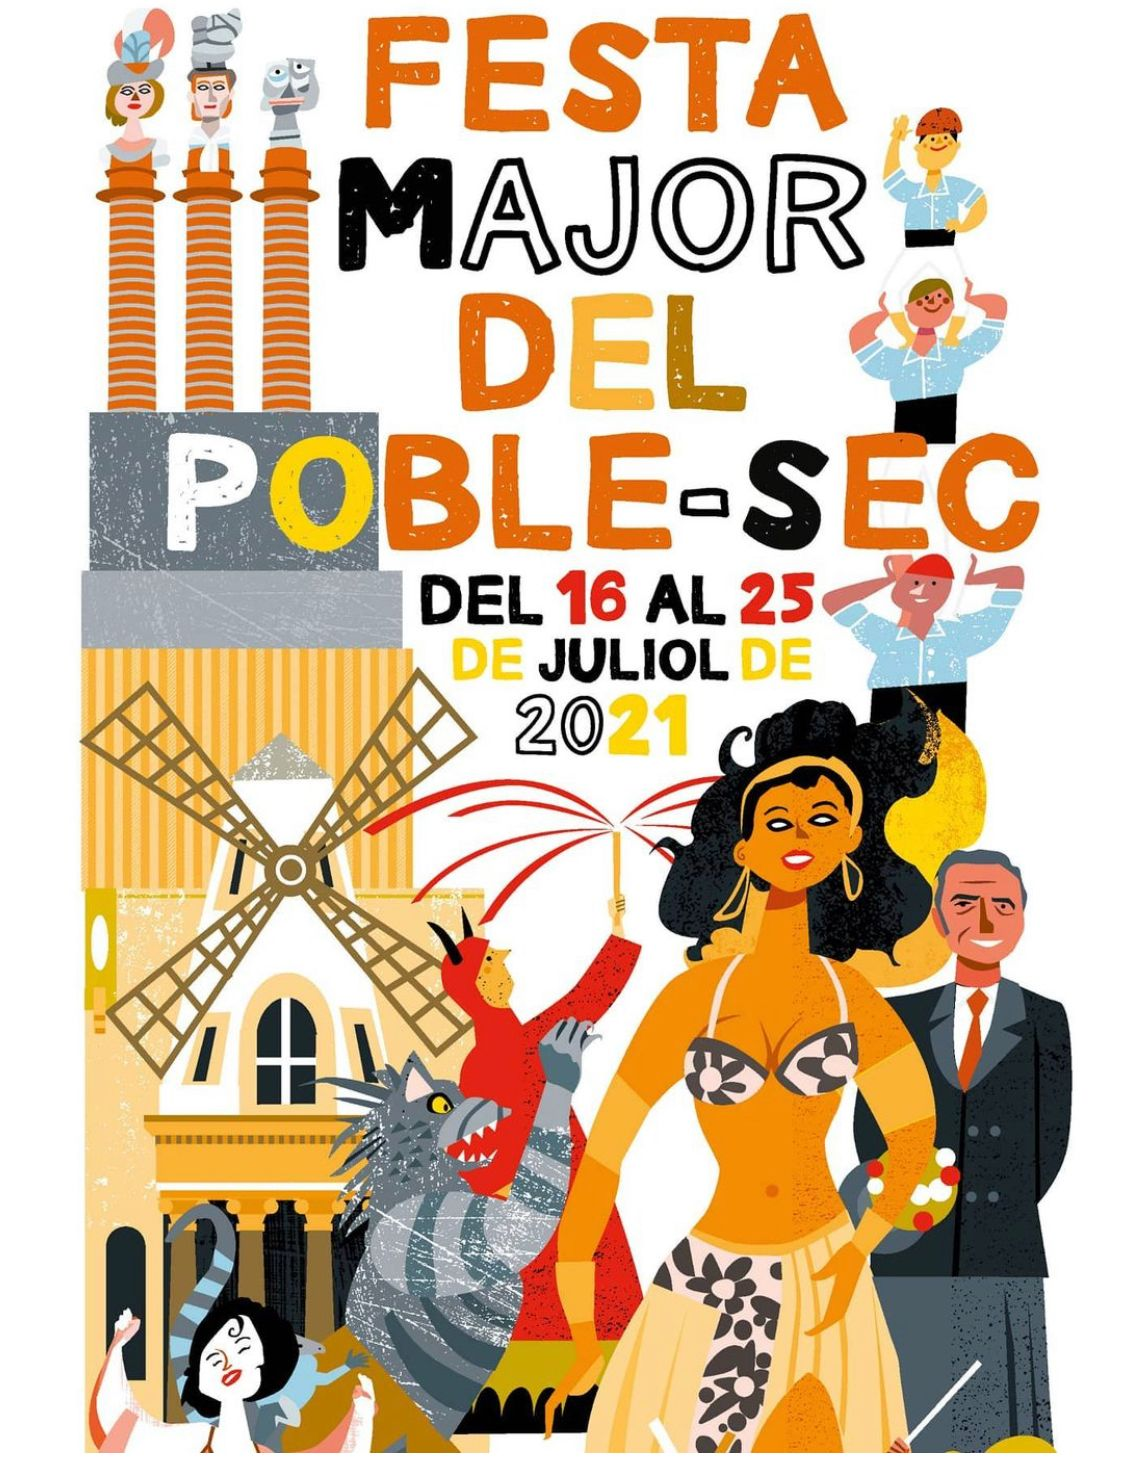 Festa Major del Poble Sec - Festes Majors Barcelona